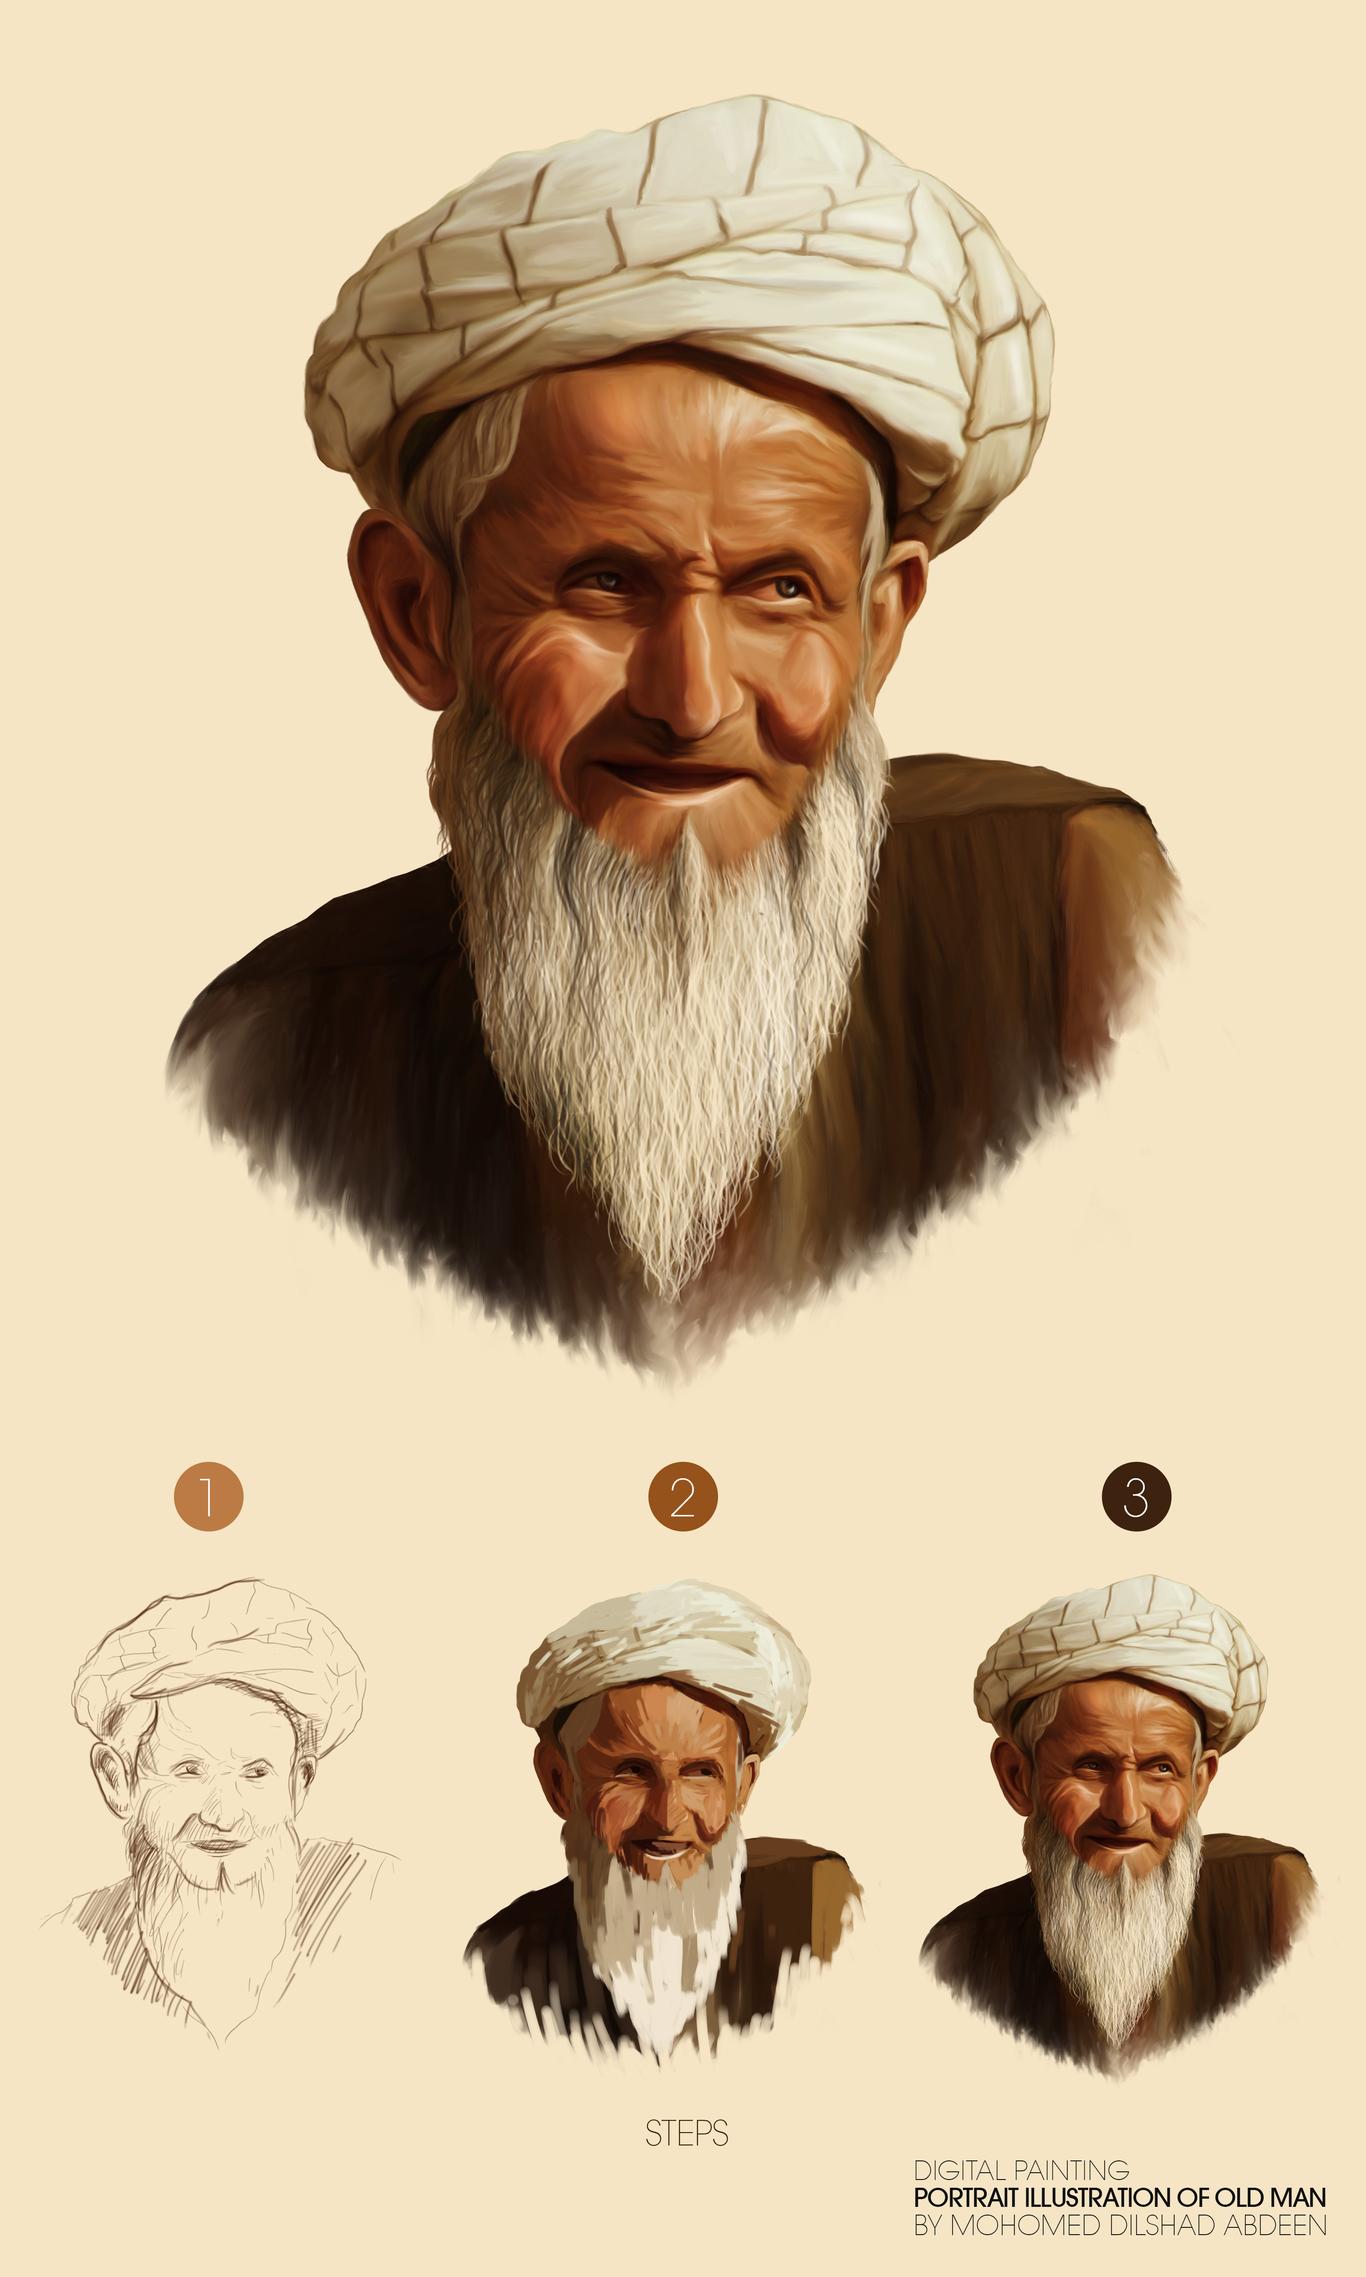 Dilshad portrait illustratio 1 2e90808e wj0n